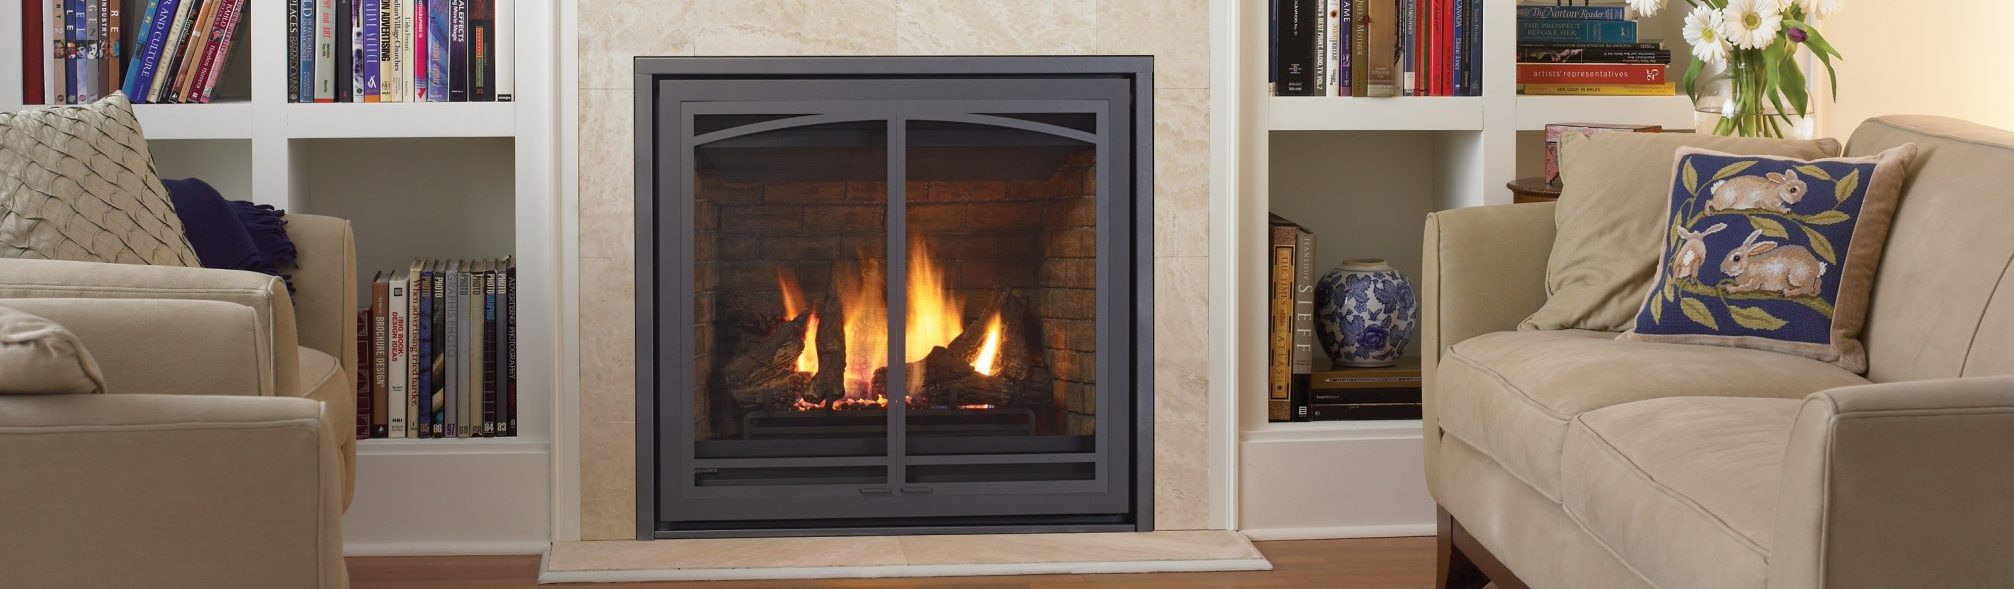 gas fireplace insert installs in Washington D.C